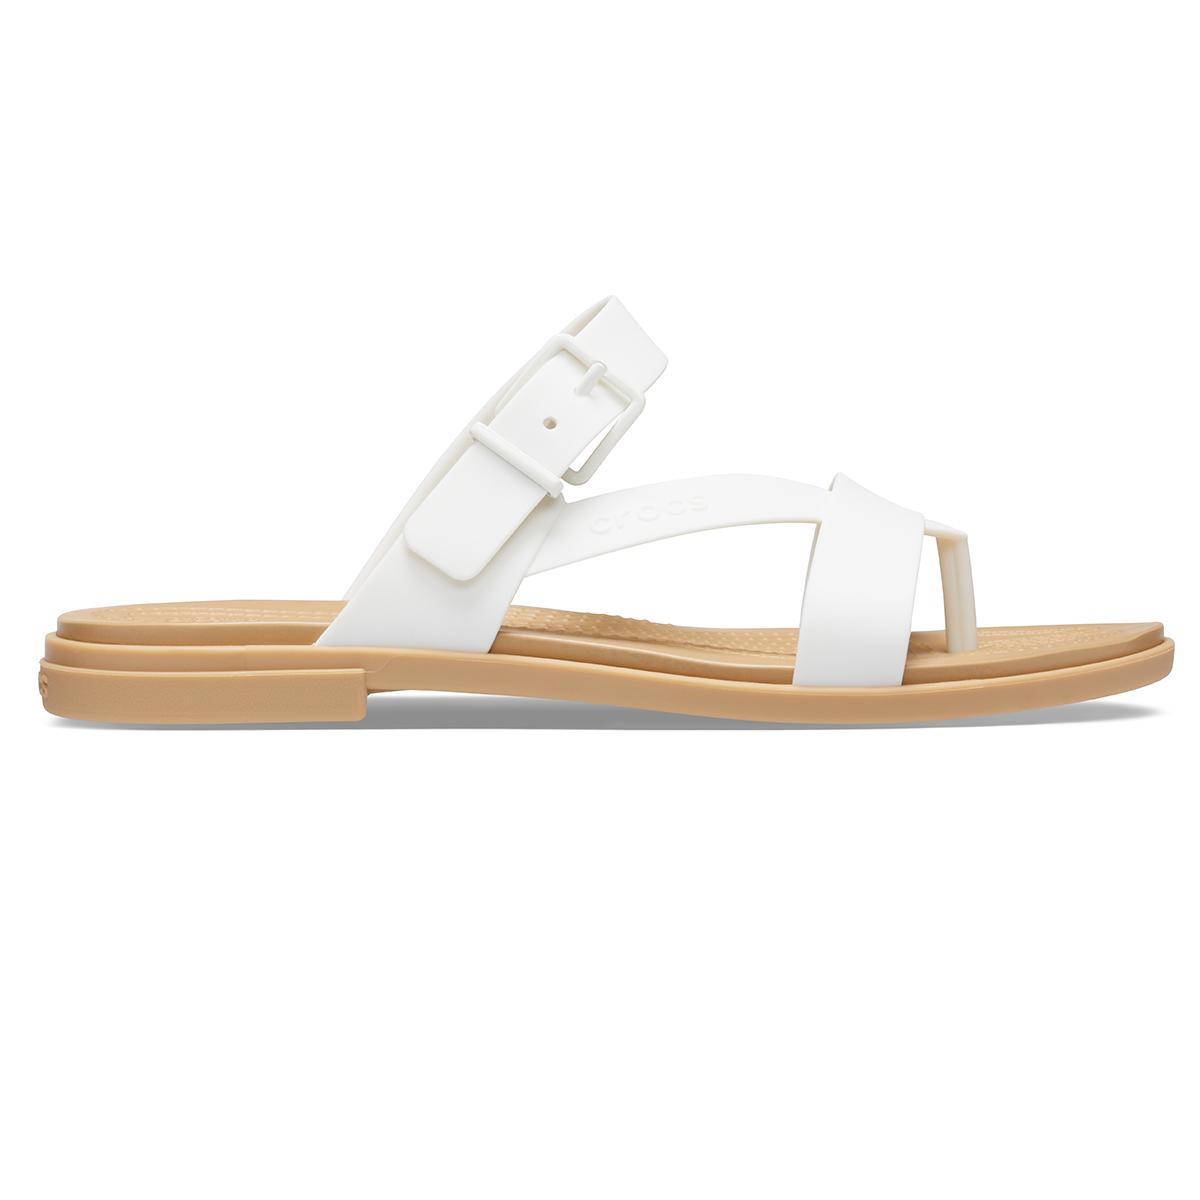 Crocs Tulum Toe Post Sandal W - Oyster/Tan